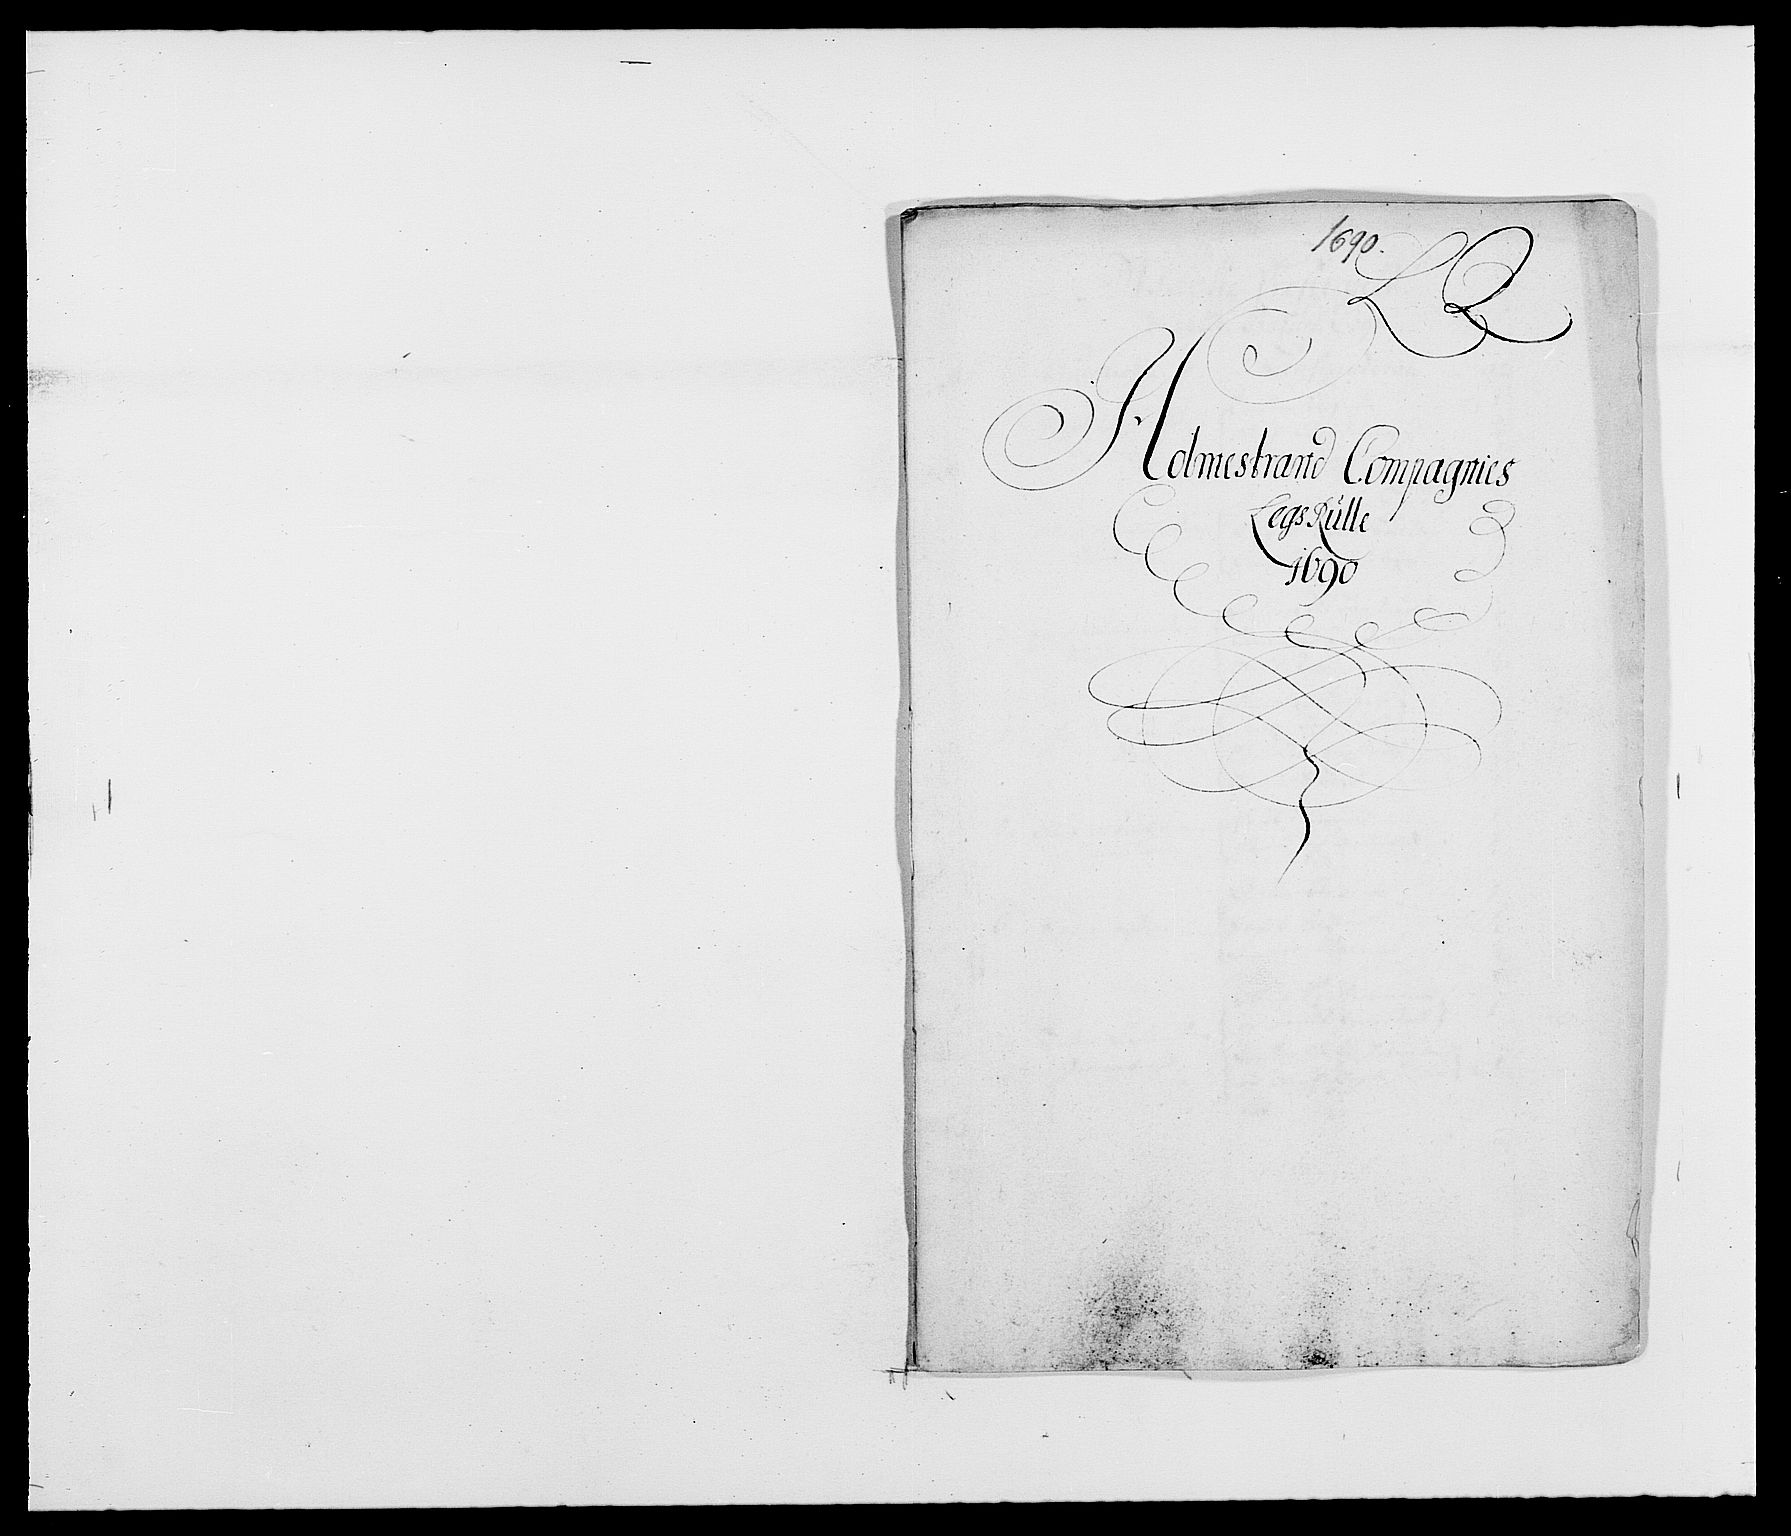 RA, Rentekammeret inntil 1814, Reviderte regnskaper, Fogderegnskap, R32/L1861: Fogderegnskap Jarlsberg grevskap, 1686-1690, s. 214